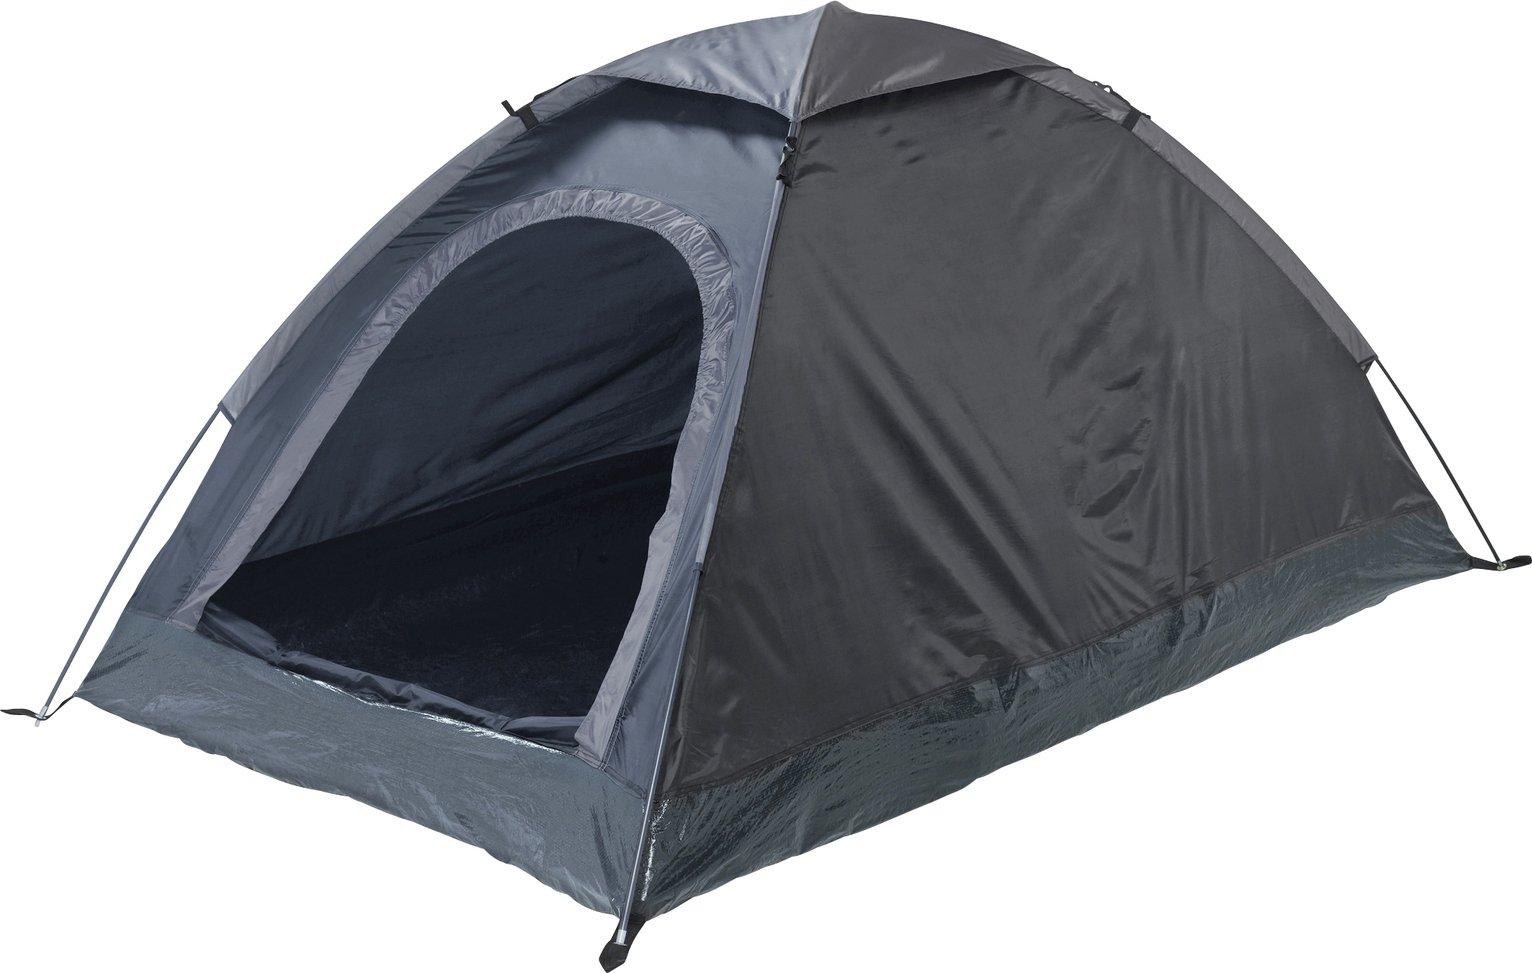 2 Person Dome Tent  sc 1 st  Argos & Tents | Argos